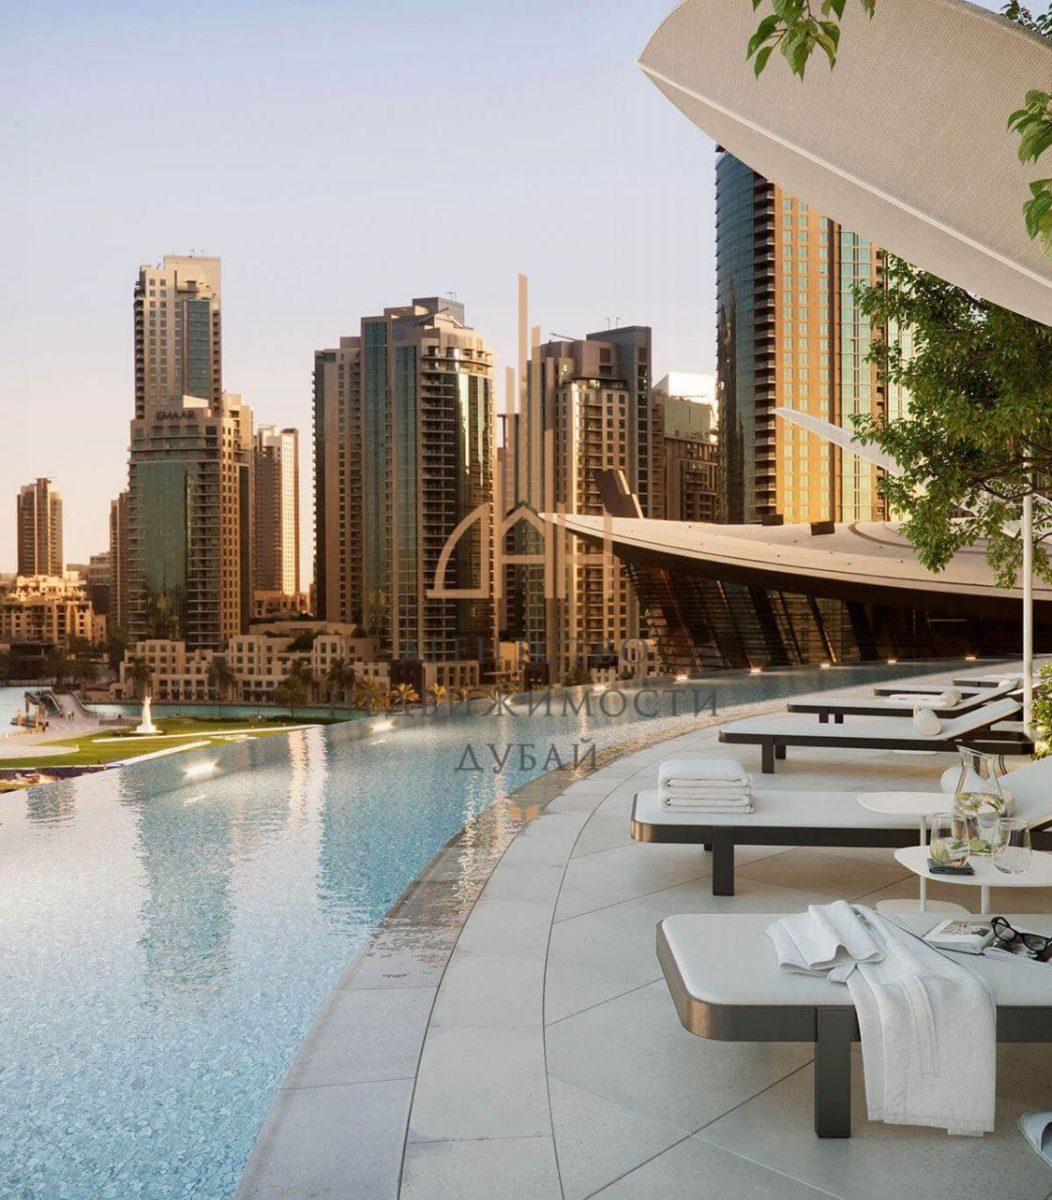 FGB, 3 Abu Dhabi realty majors запускают СП по недвижимости стоимостью $ 500 млн